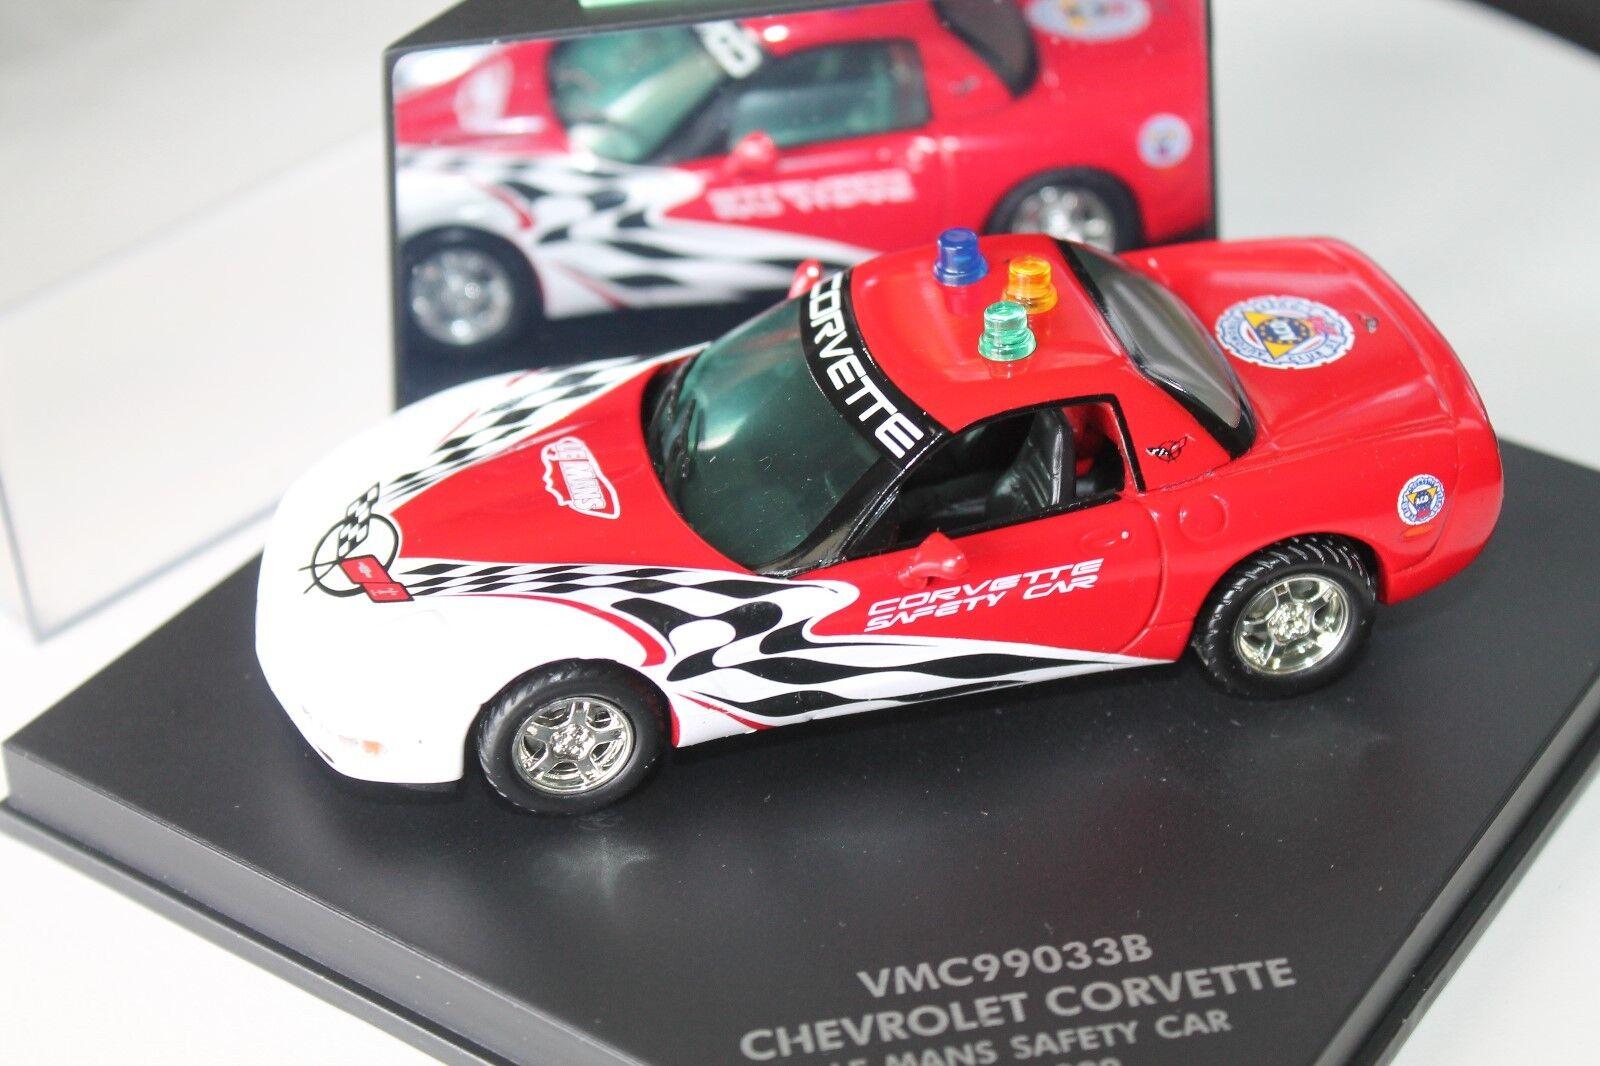 VITESSE  CHEVROLET Corvette  Le Mans SAFETY CAR 1999  1 43  Neuf dans sa boîte